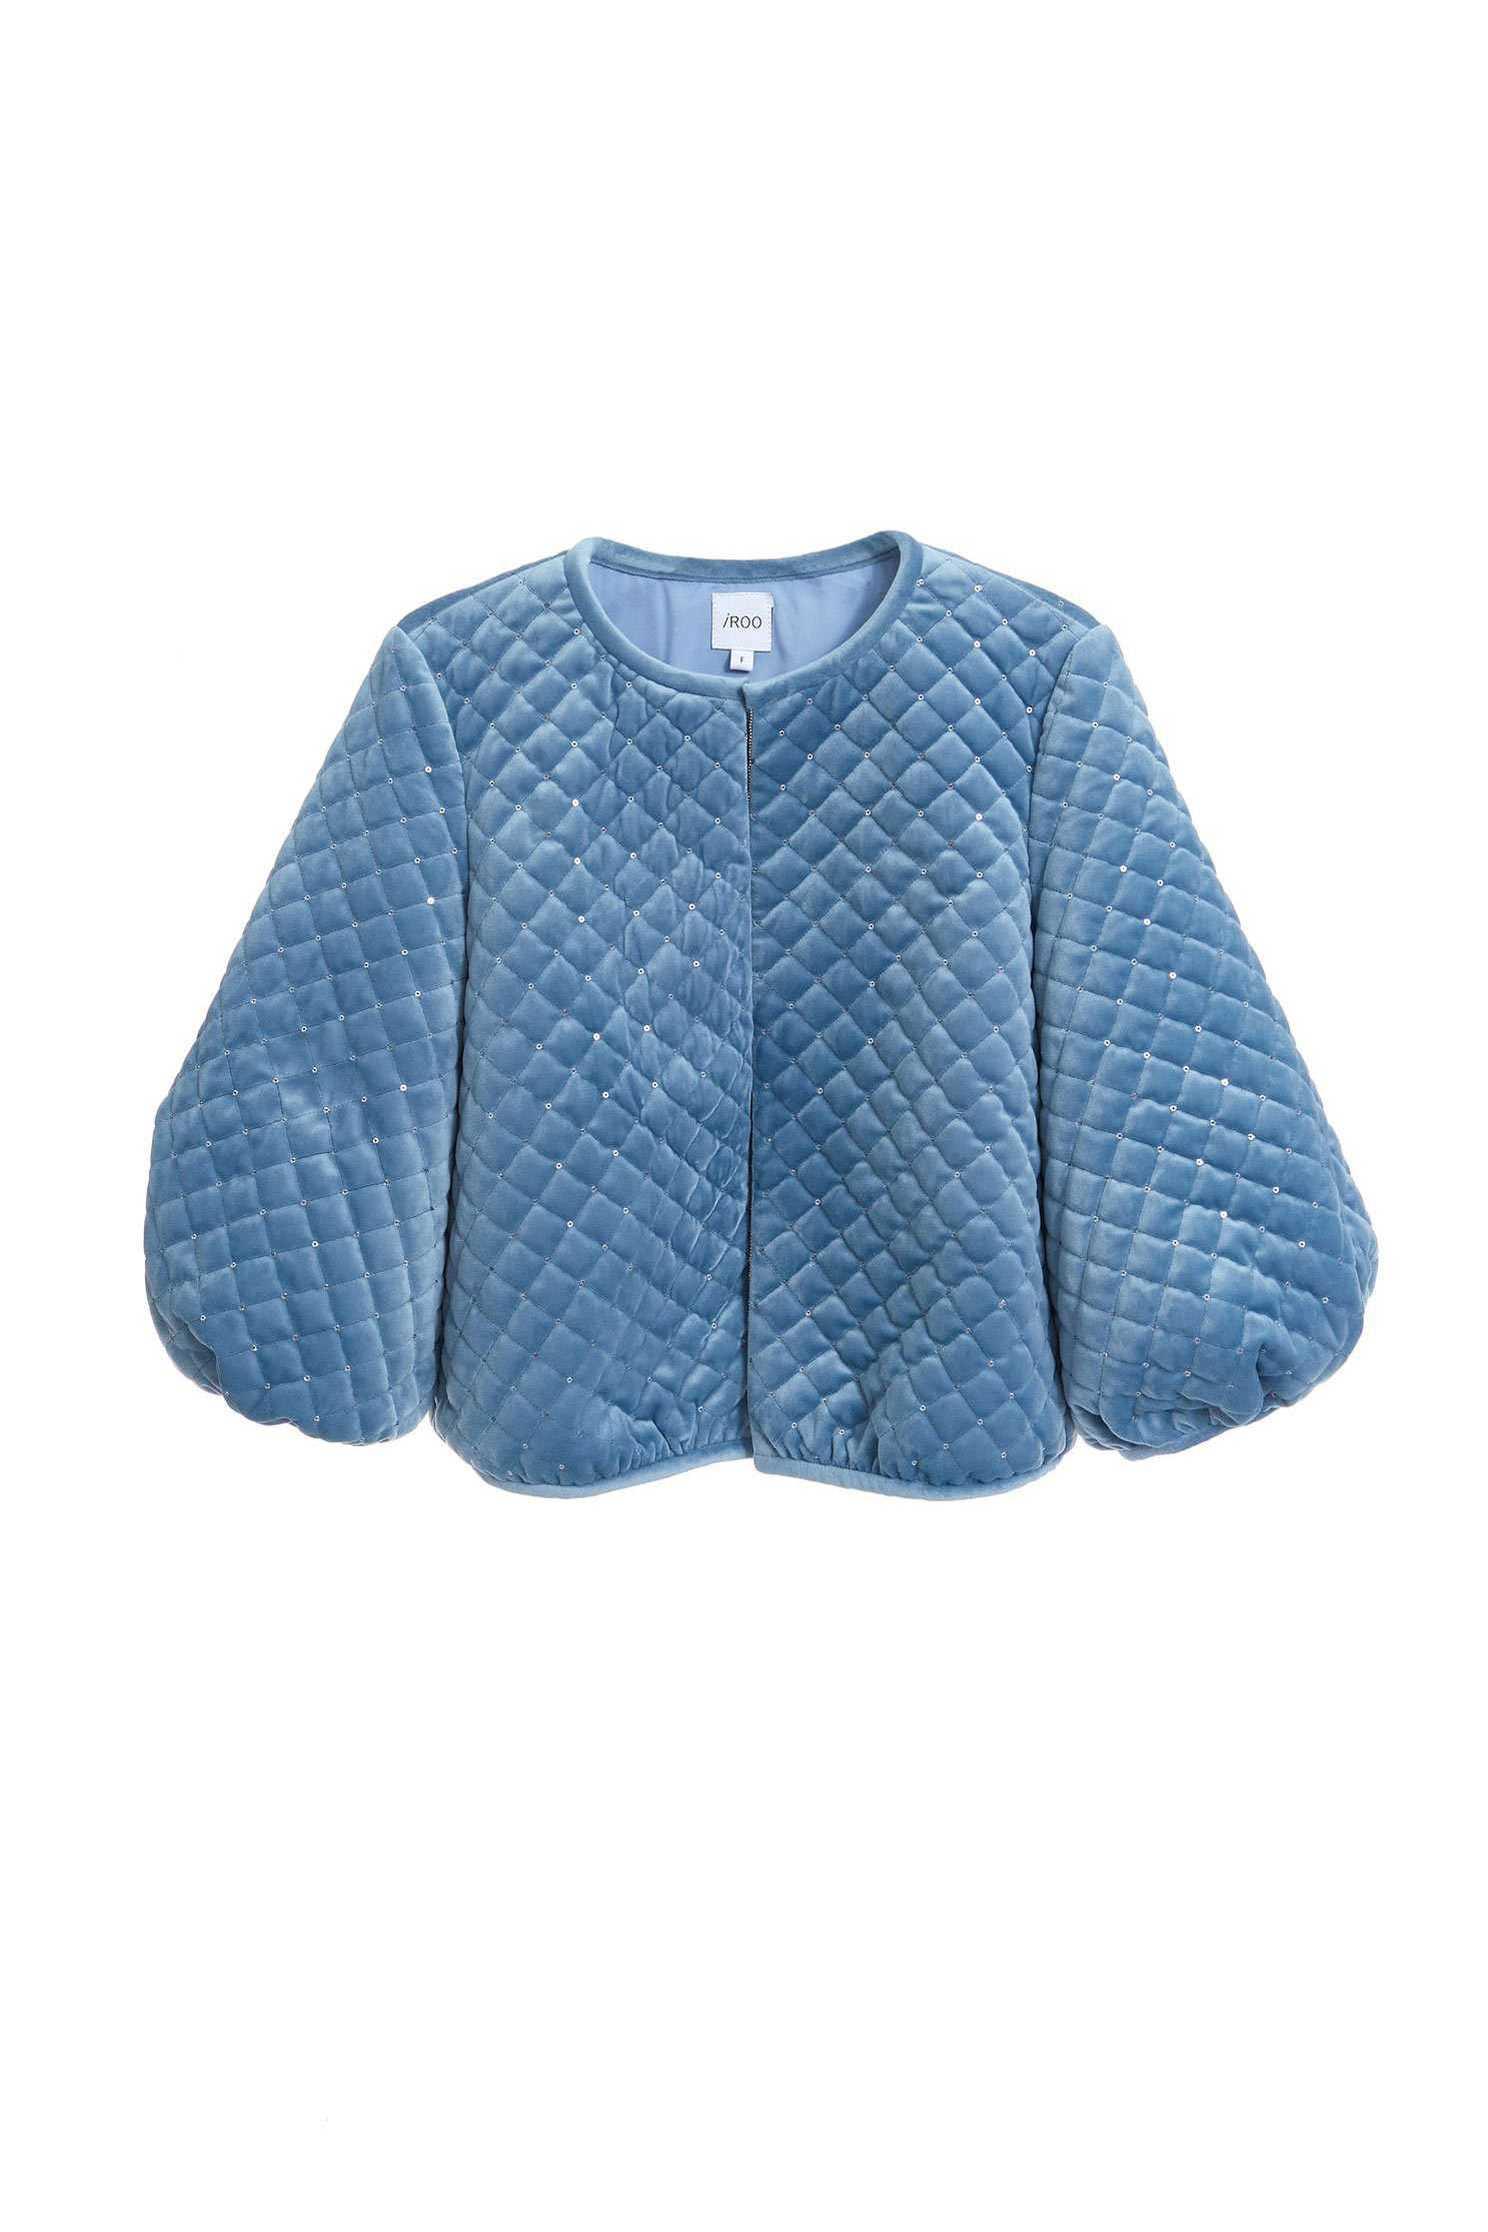 Cottoned style coat,Jacket,外套,Cardigan,長袖外套